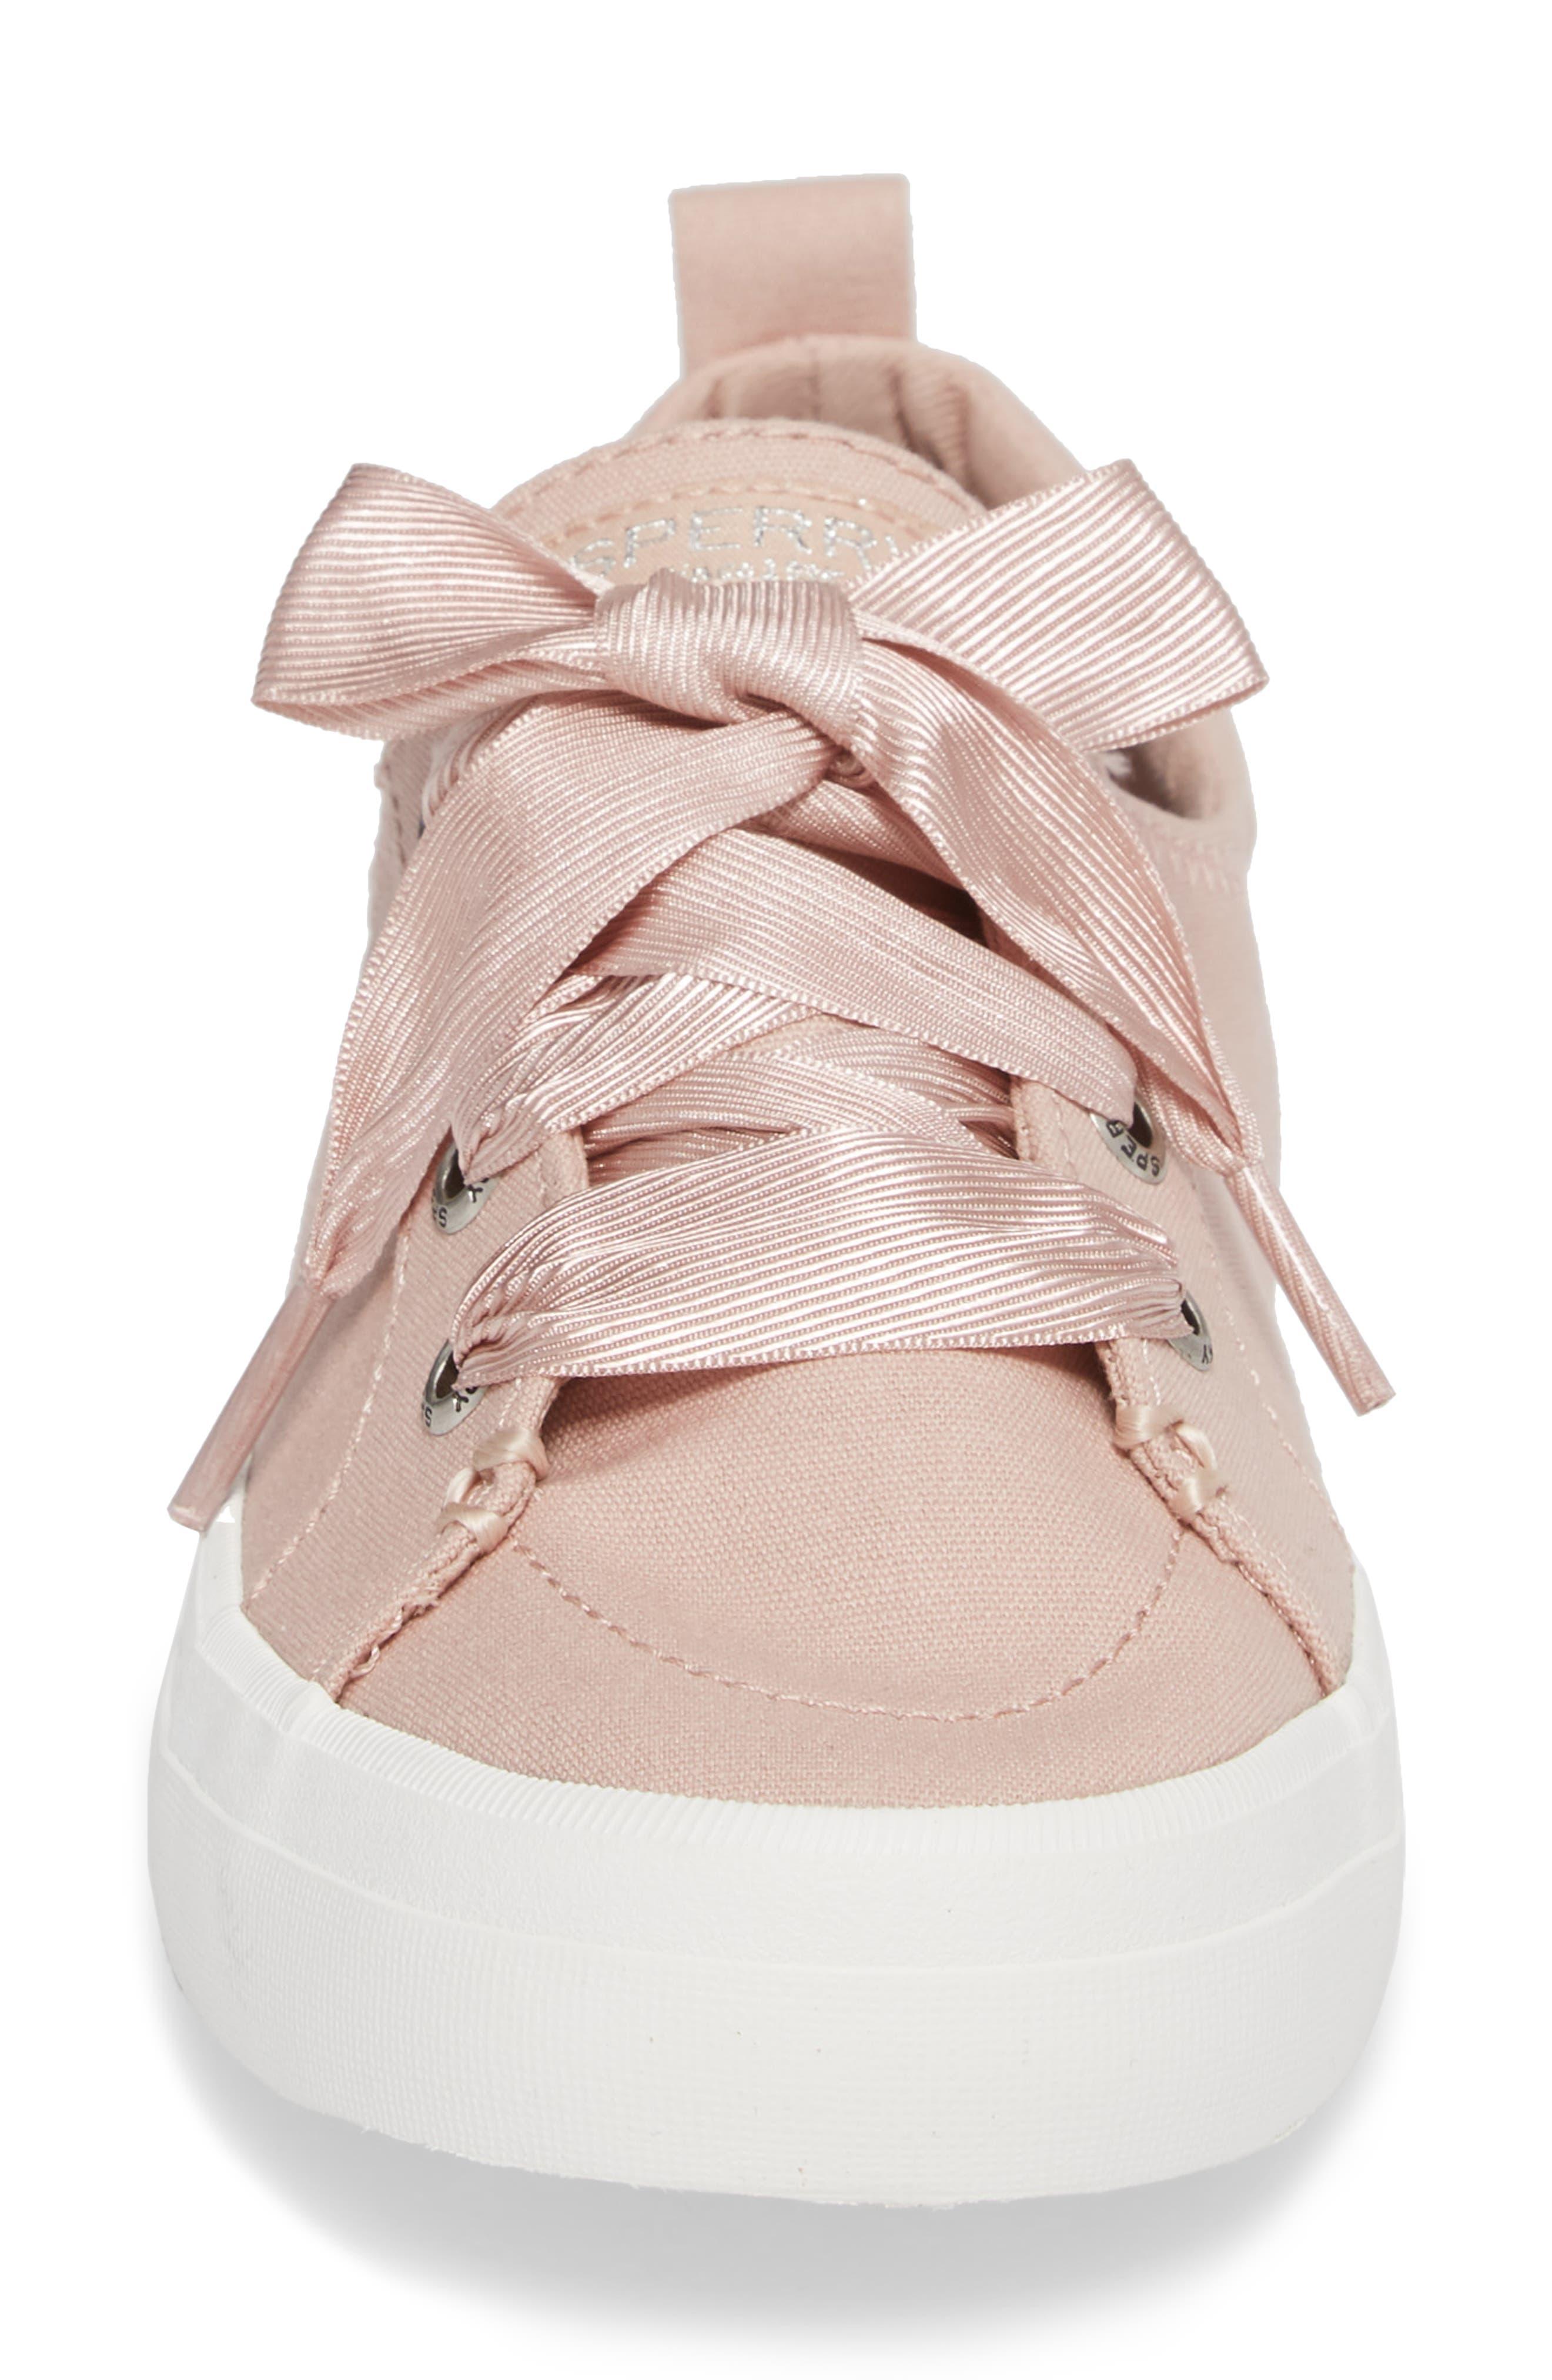 Crest Vibe Satin Lace Sneaker,                             Alternate thumbnail 4, color,                             Rose Dust Canvas